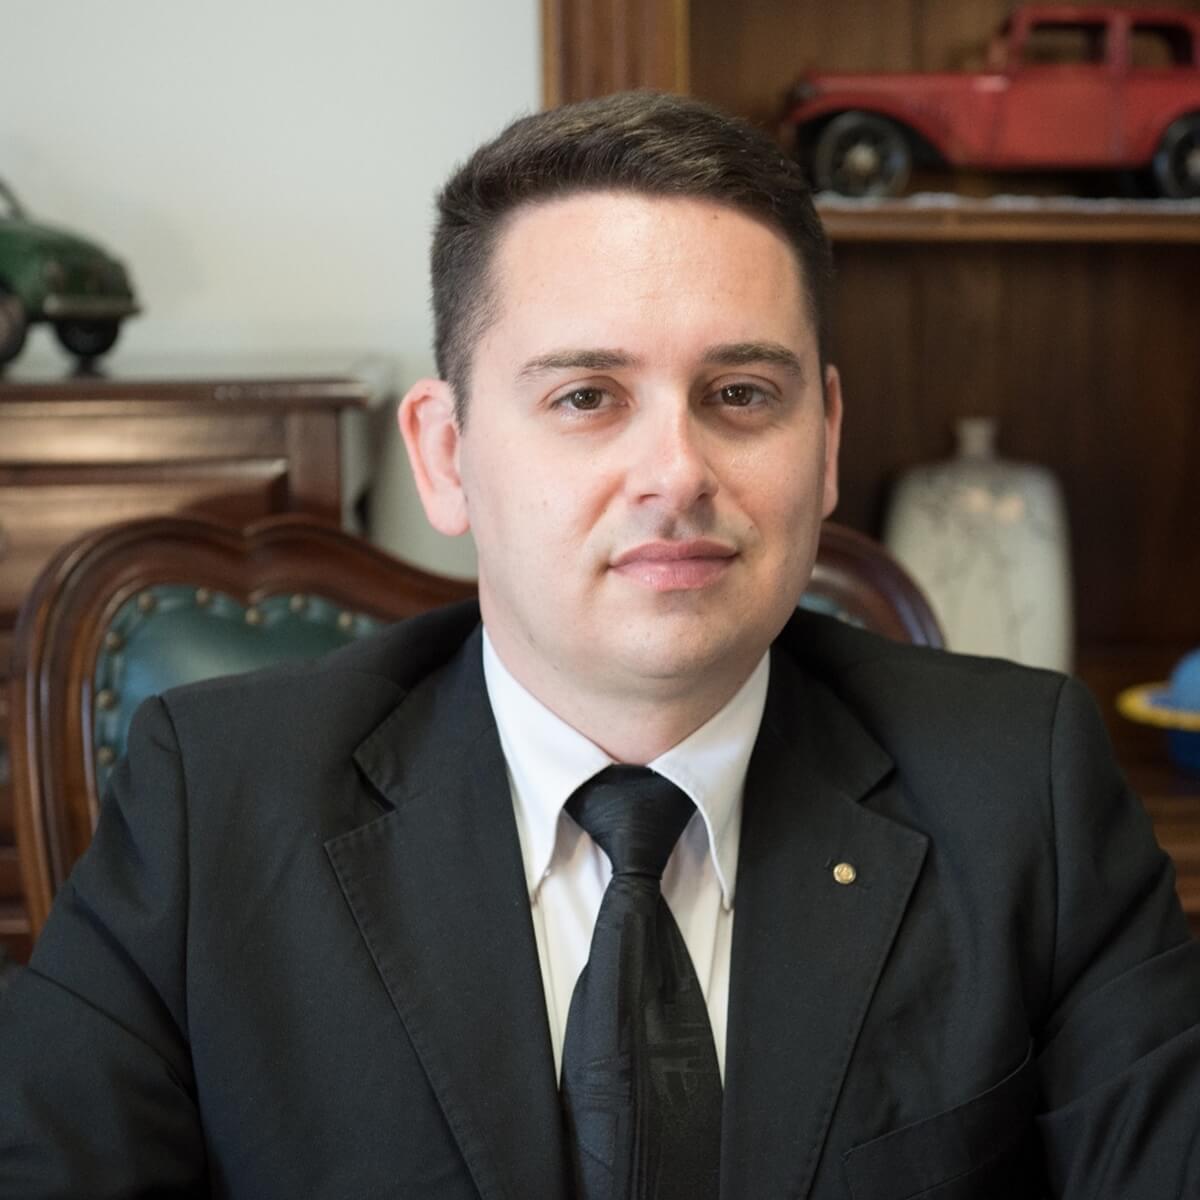 Simone Caddeo